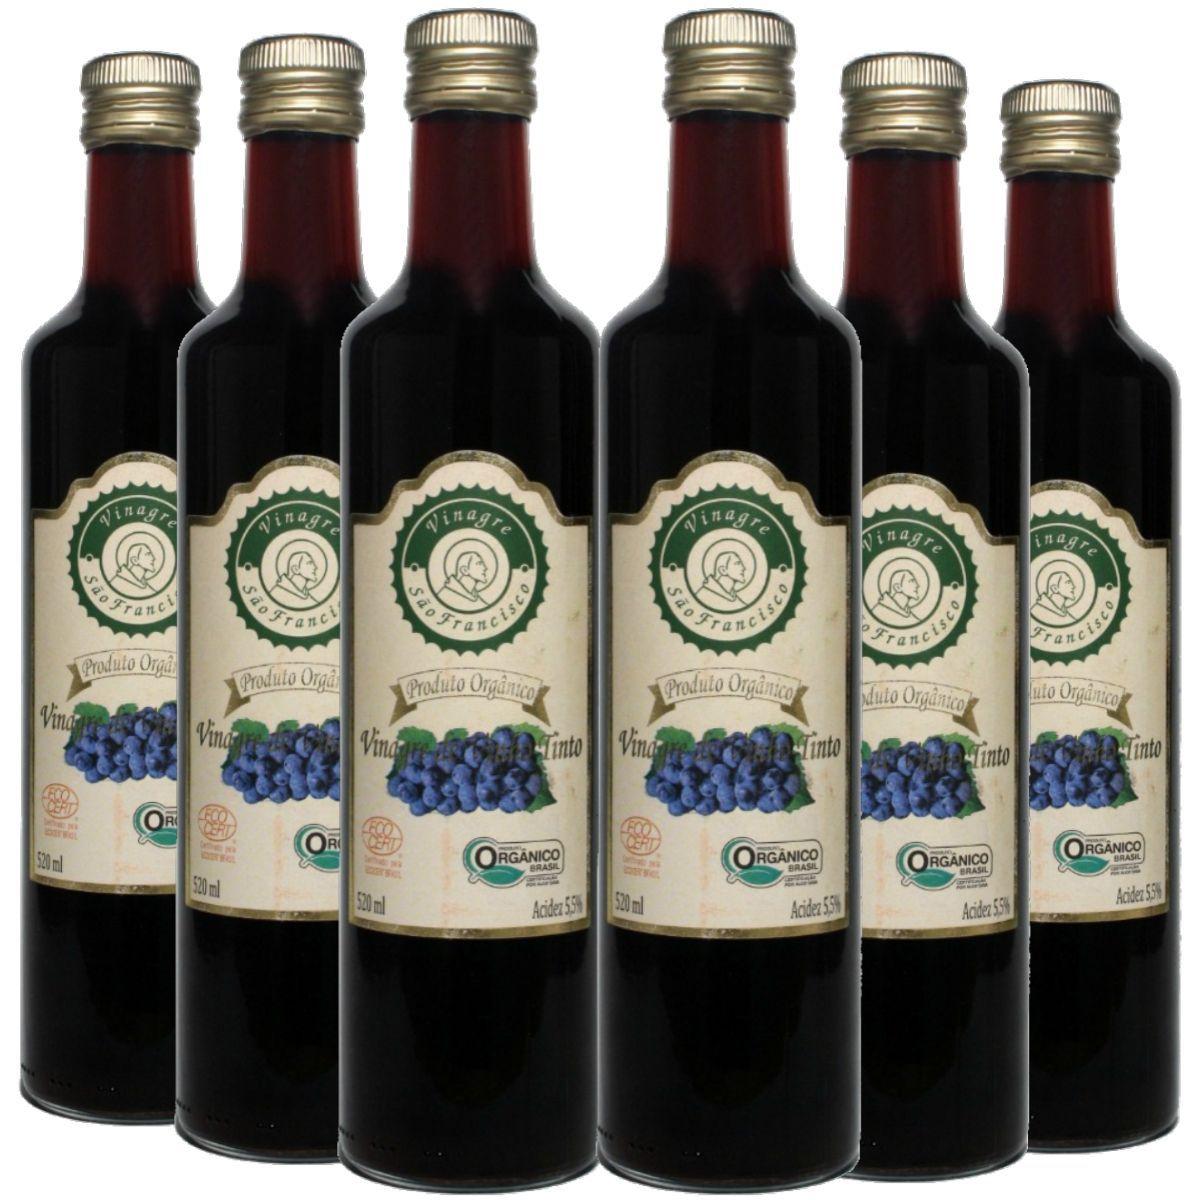 Kit 6 Vinagre Orgânico São Francisco Vinho Tinto Acidez 5,5% - 500ml